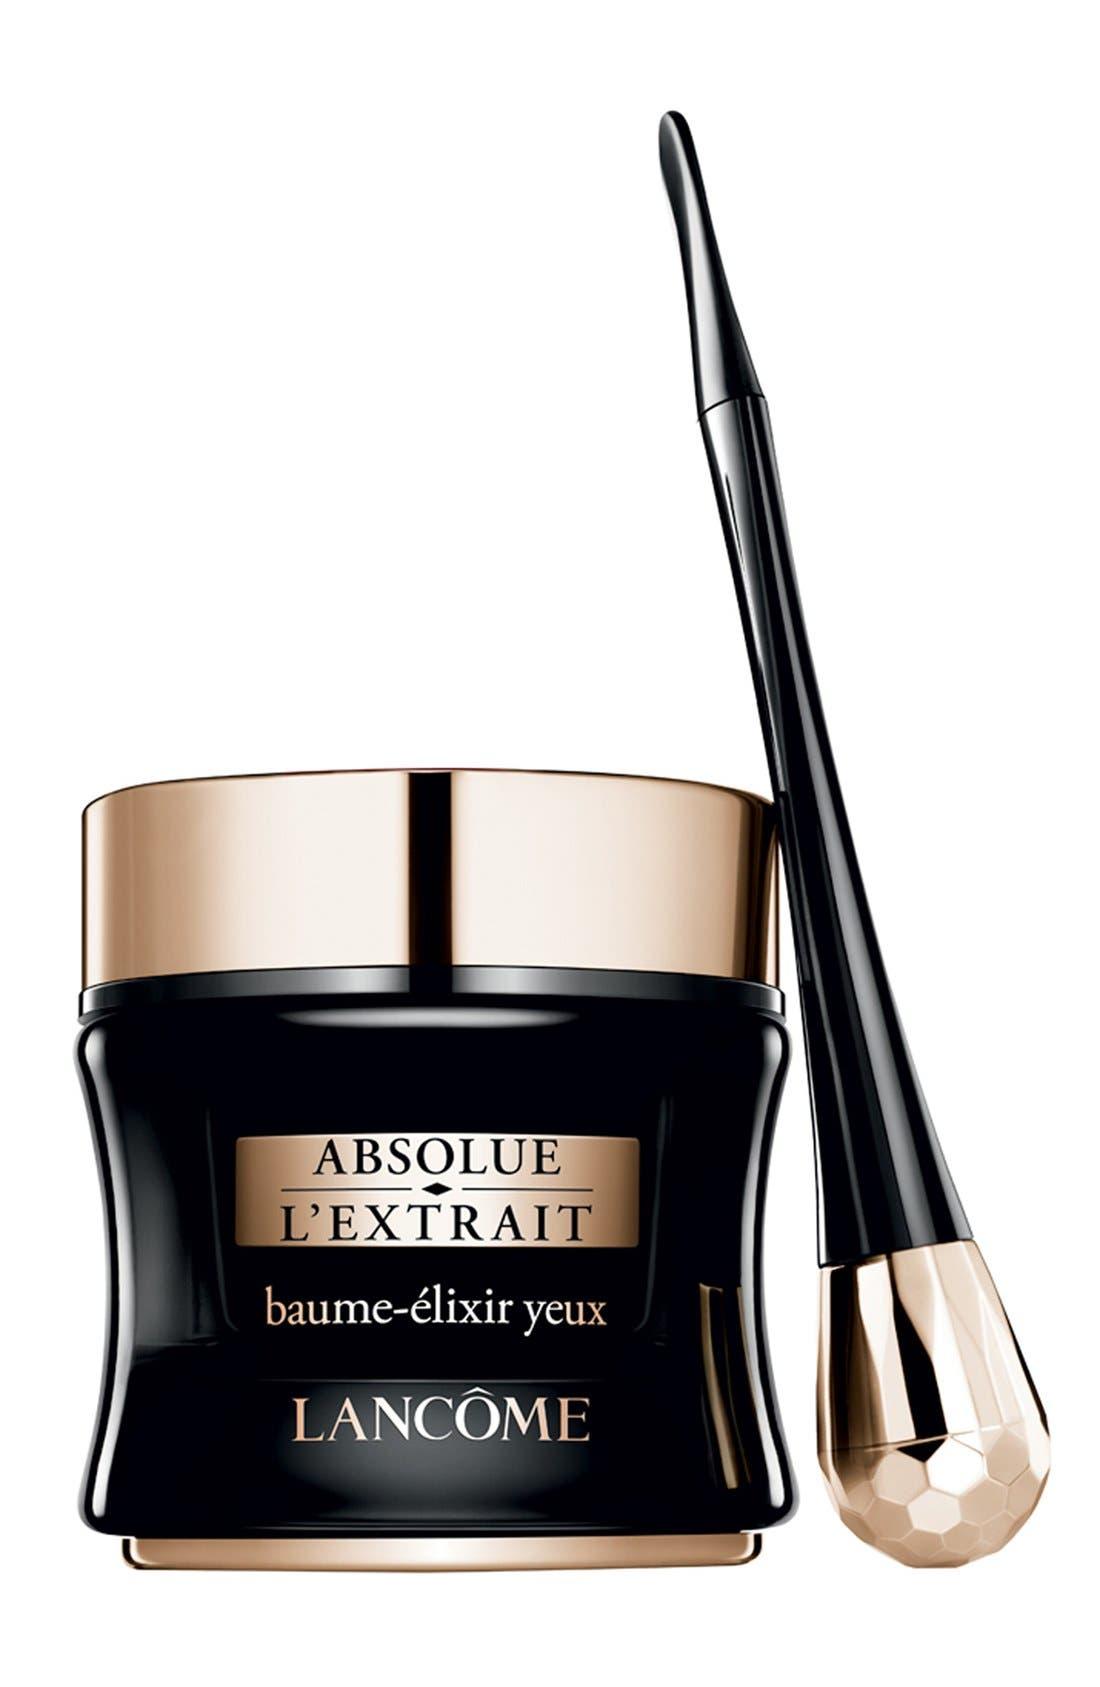 Lancôme Absolue LExtrait Ultimate Eye Contour Elixir